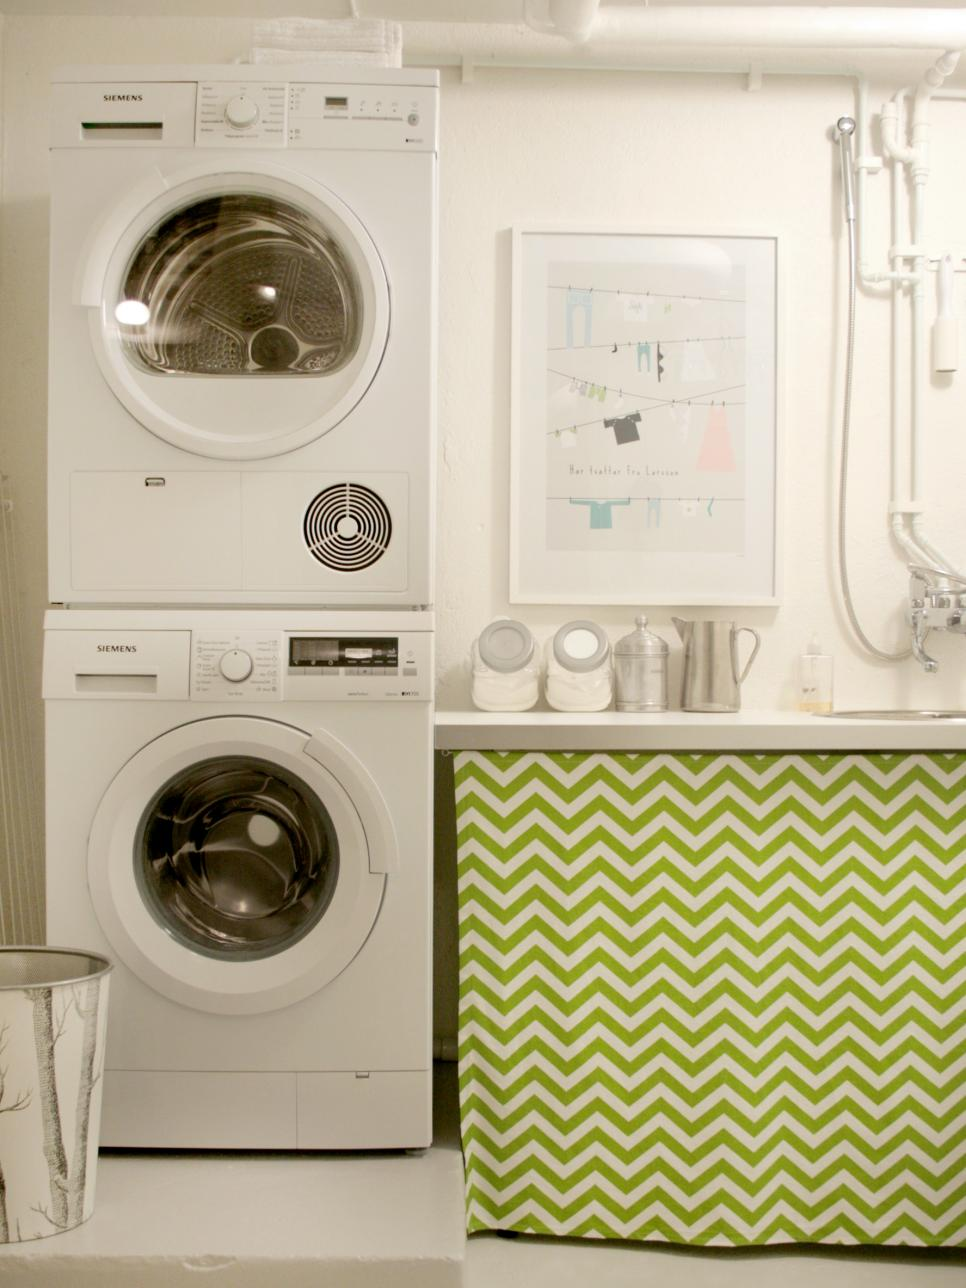 10 Chic Laundry Room Decorating Ideas | HGTV